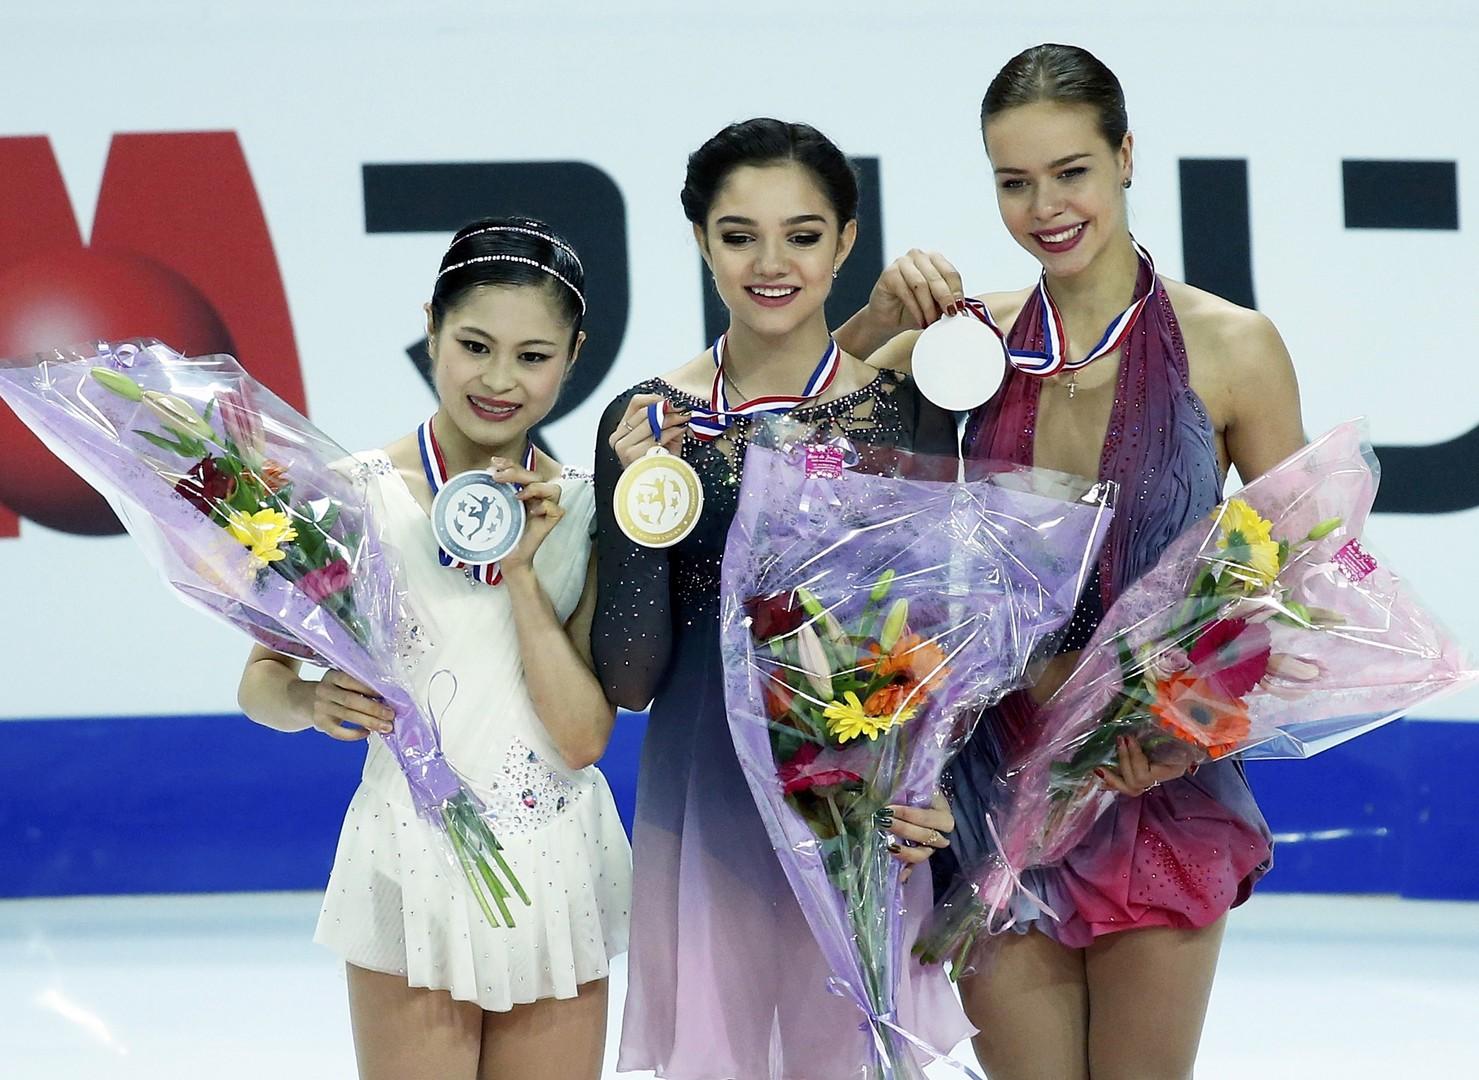 На грани рекорда: Евгения Медведева выиграла финал Гран-при по фигурному катанию